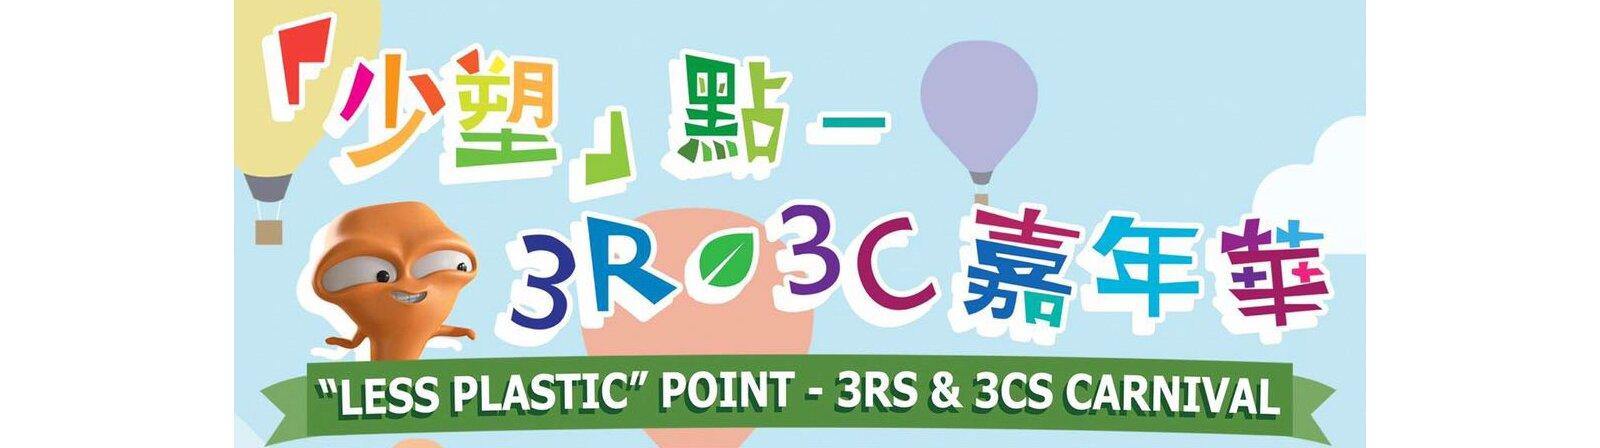 """Less Plastic"" Point – 3Rs & 3Cs Carnival"